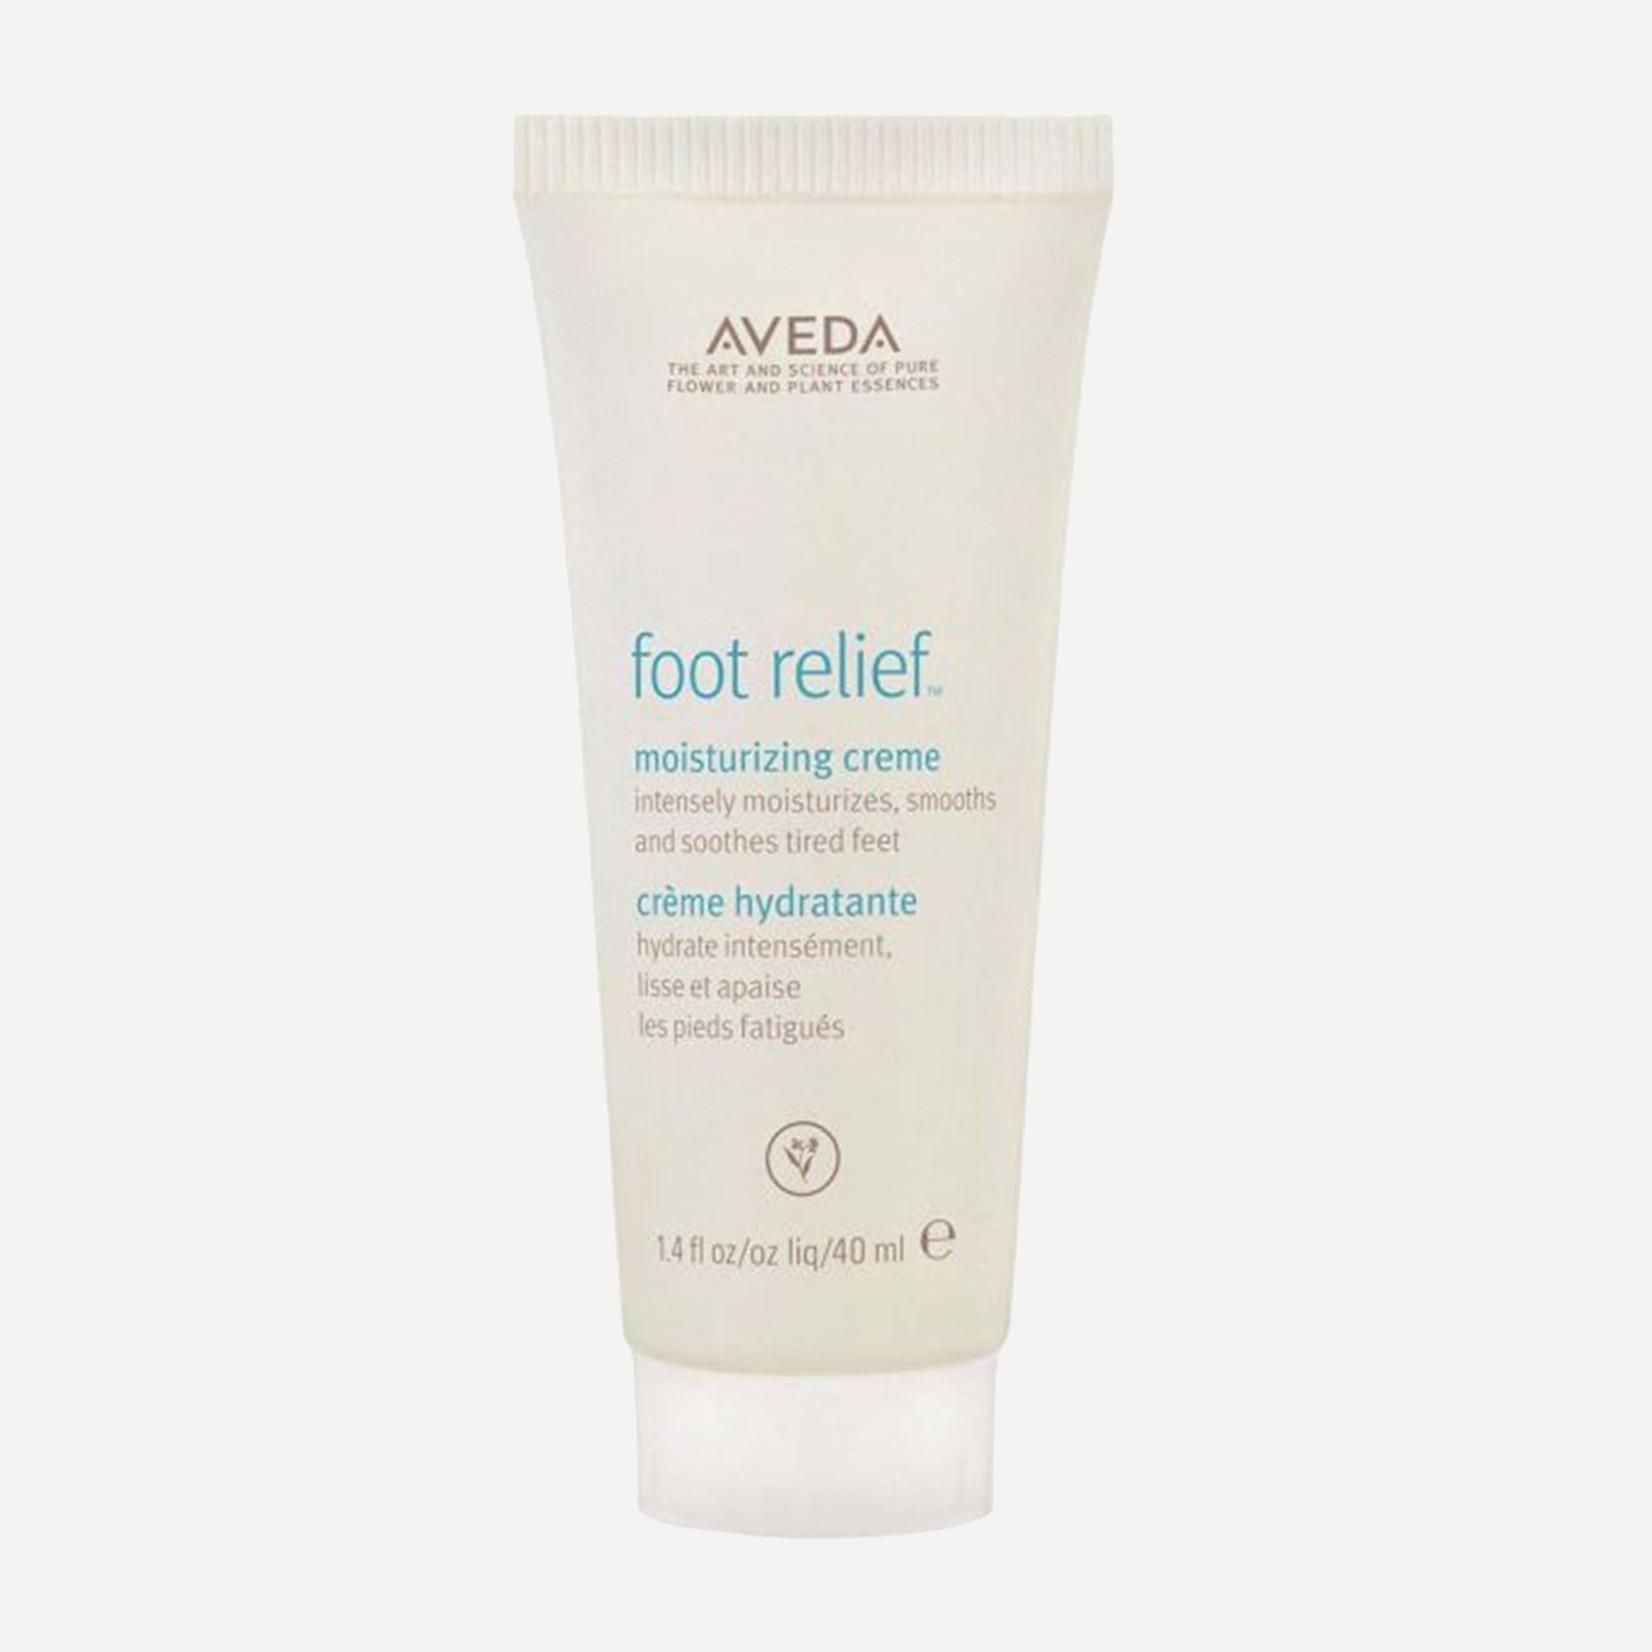 AVEDA Foot Relief™ Moisturizing Creme